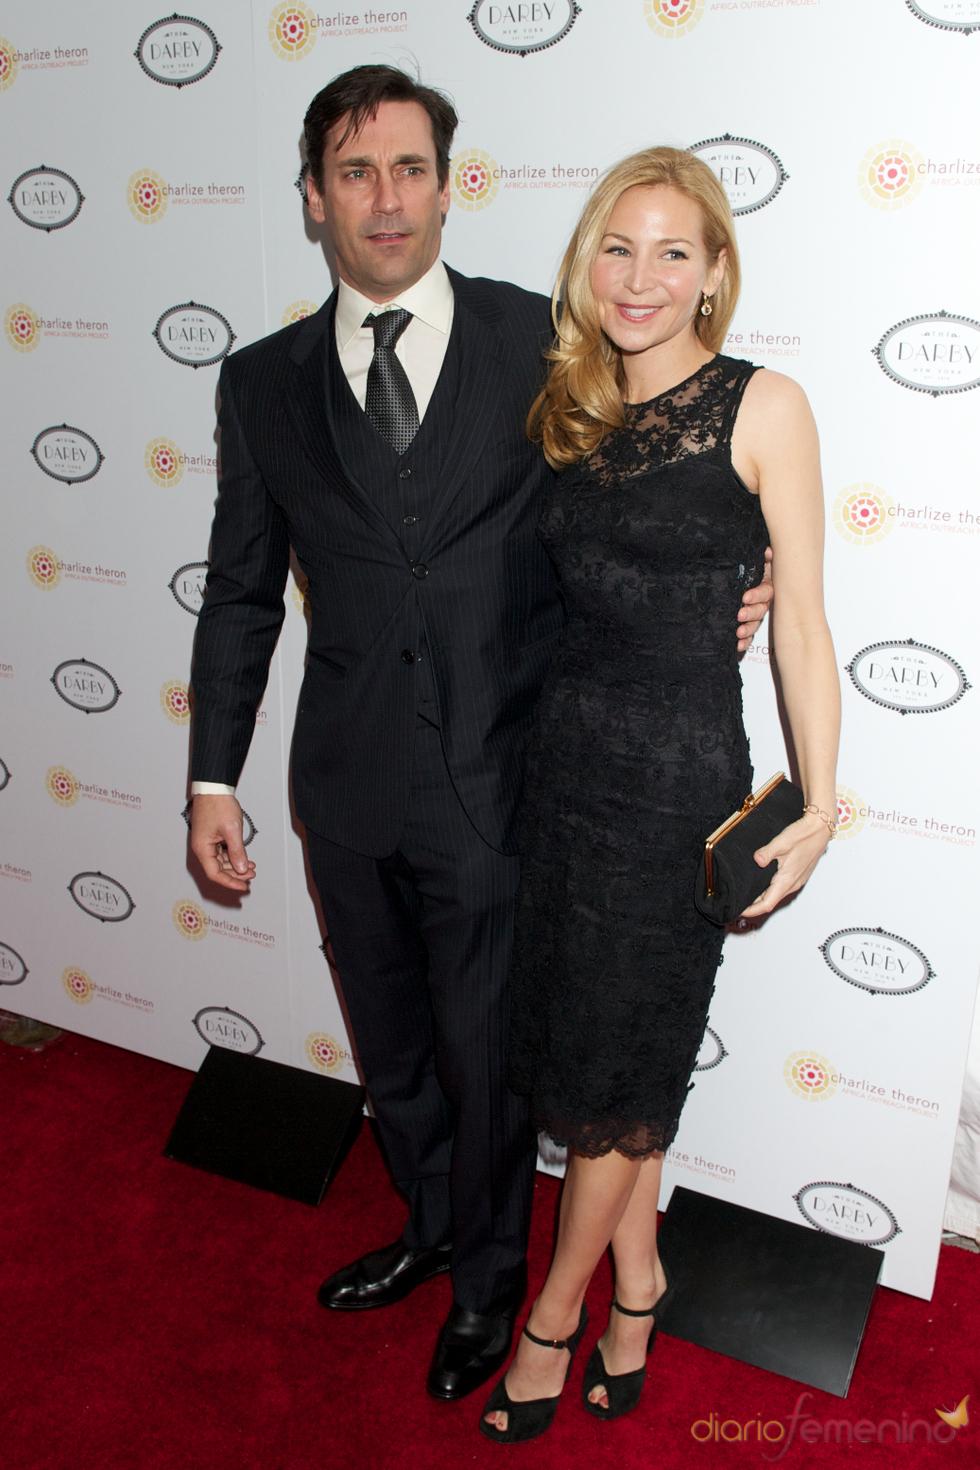 Jon Hamm y Jennifer Westfeldt acudieron a la fiesta benéfica de Charlize Theron